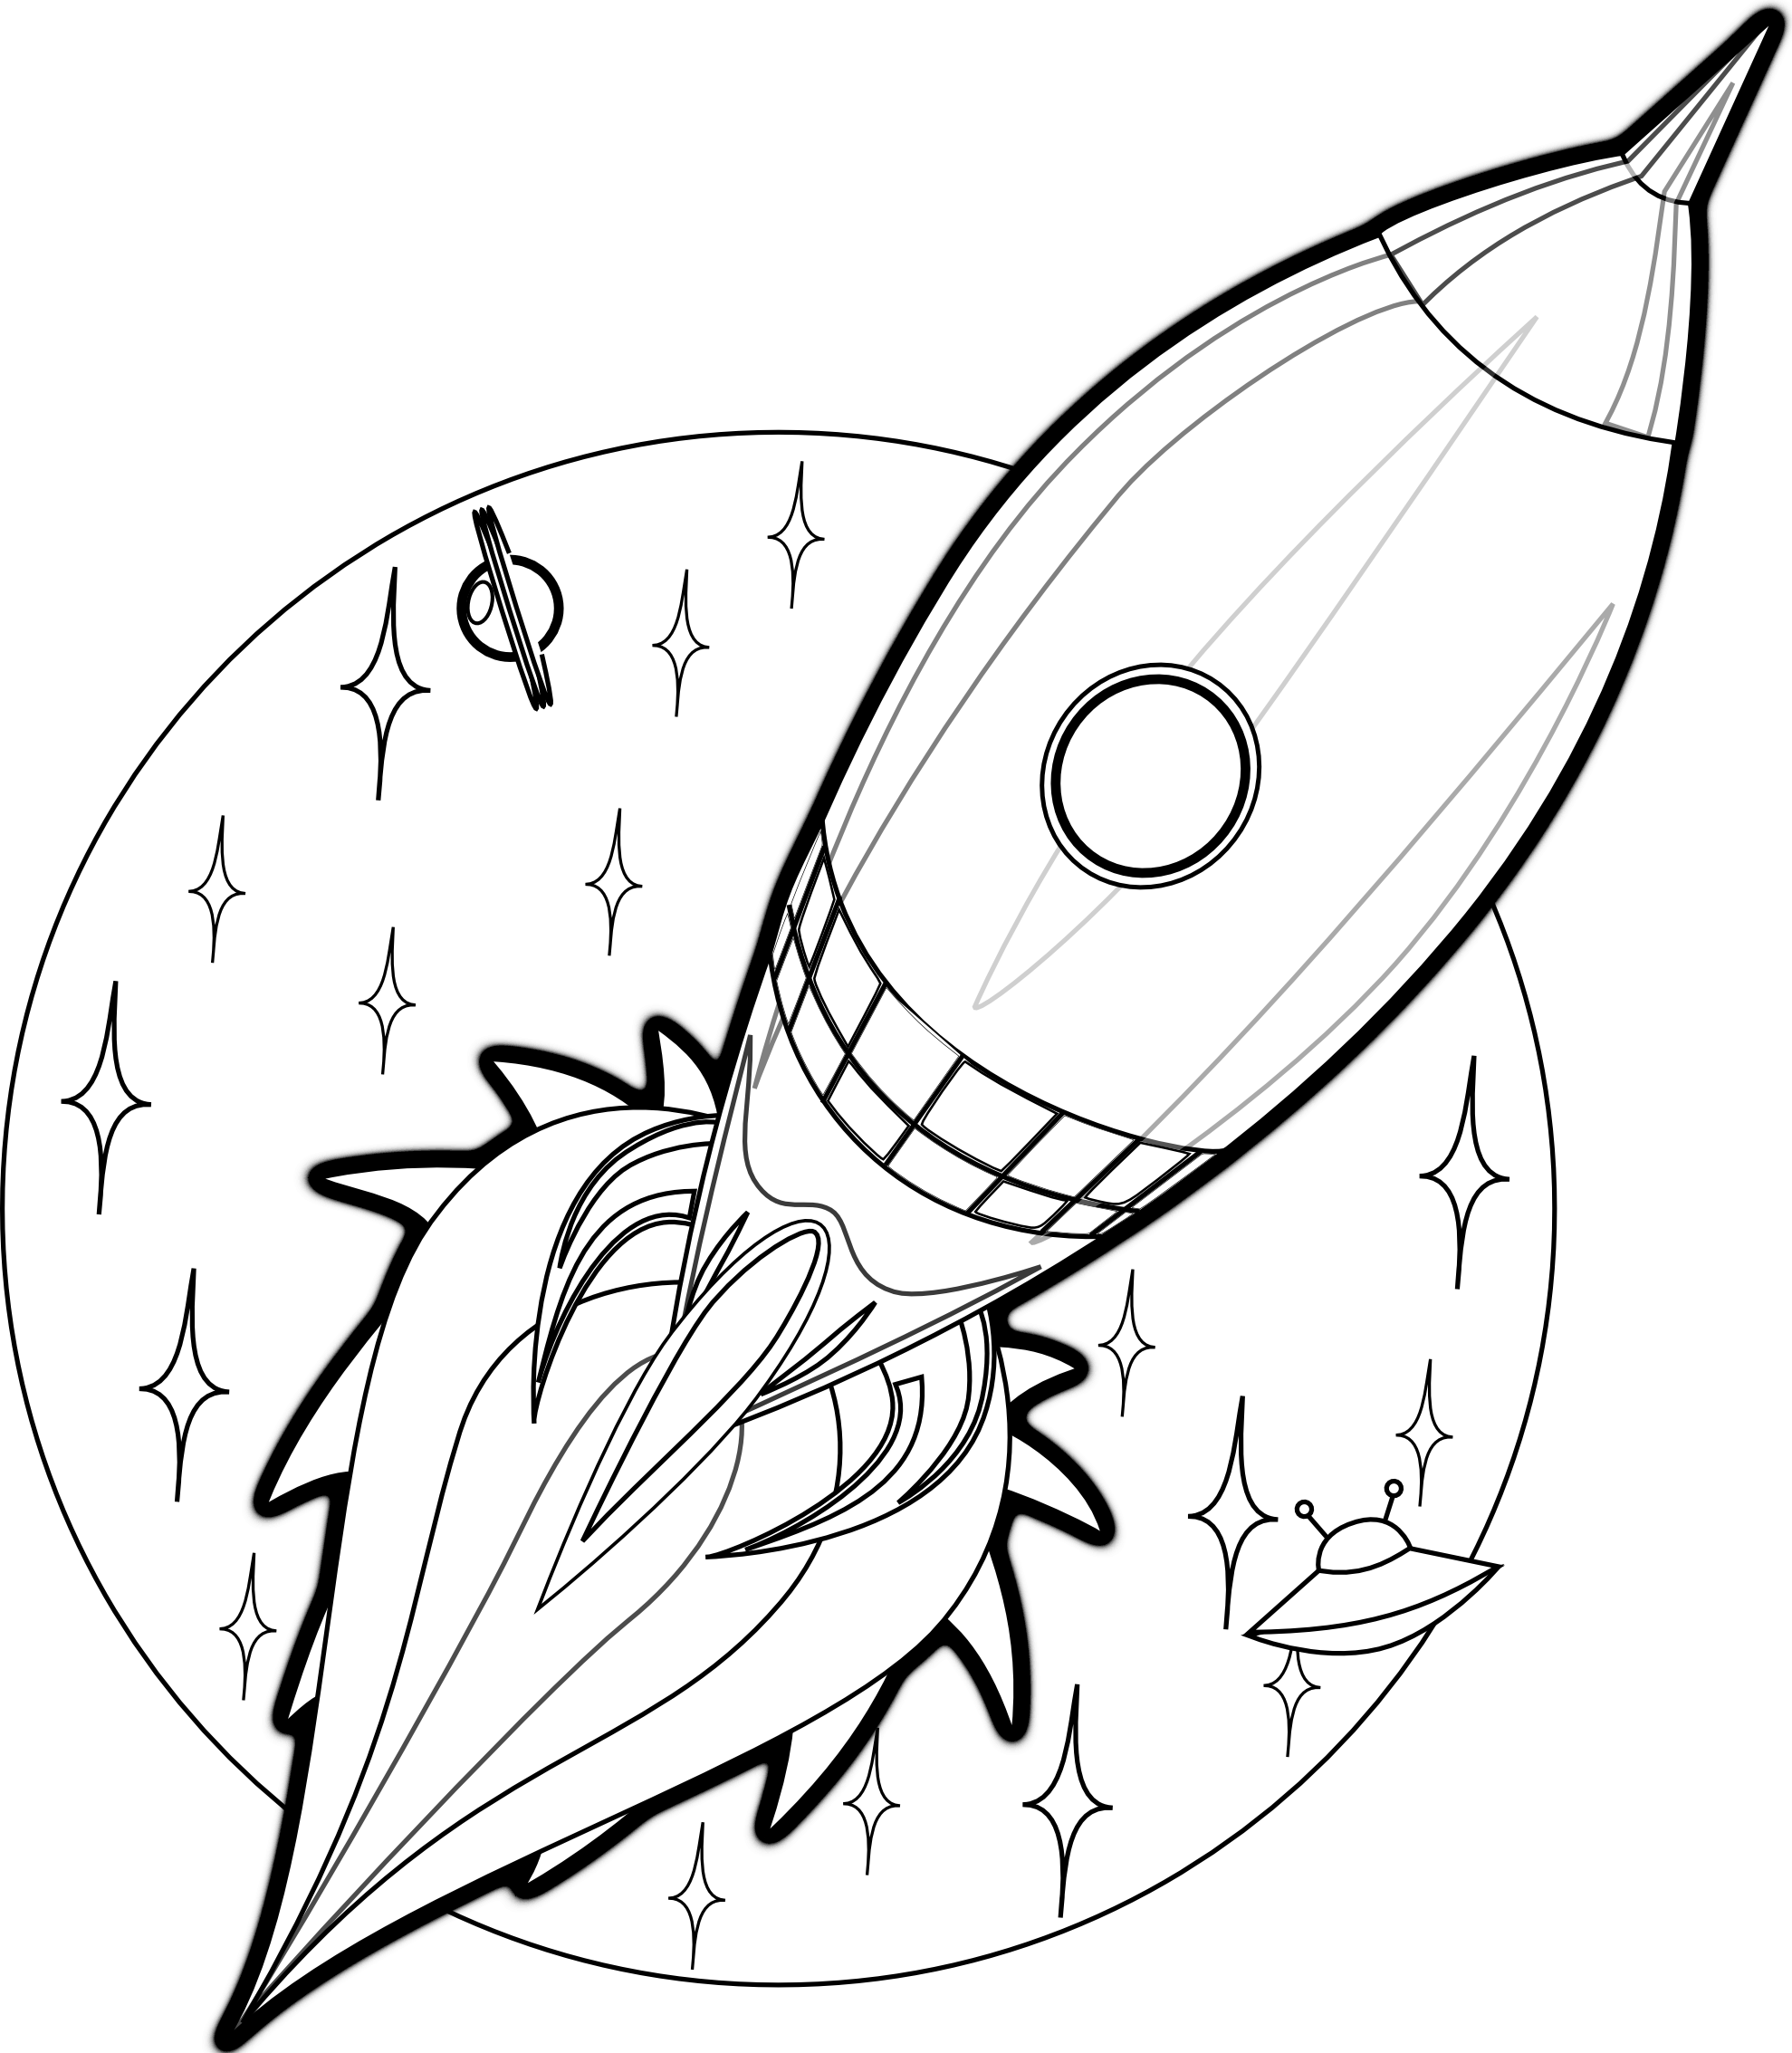 rocket ship coloring page printable rocket ship coloring pages for kids cool2bkids ship coloring page rocket